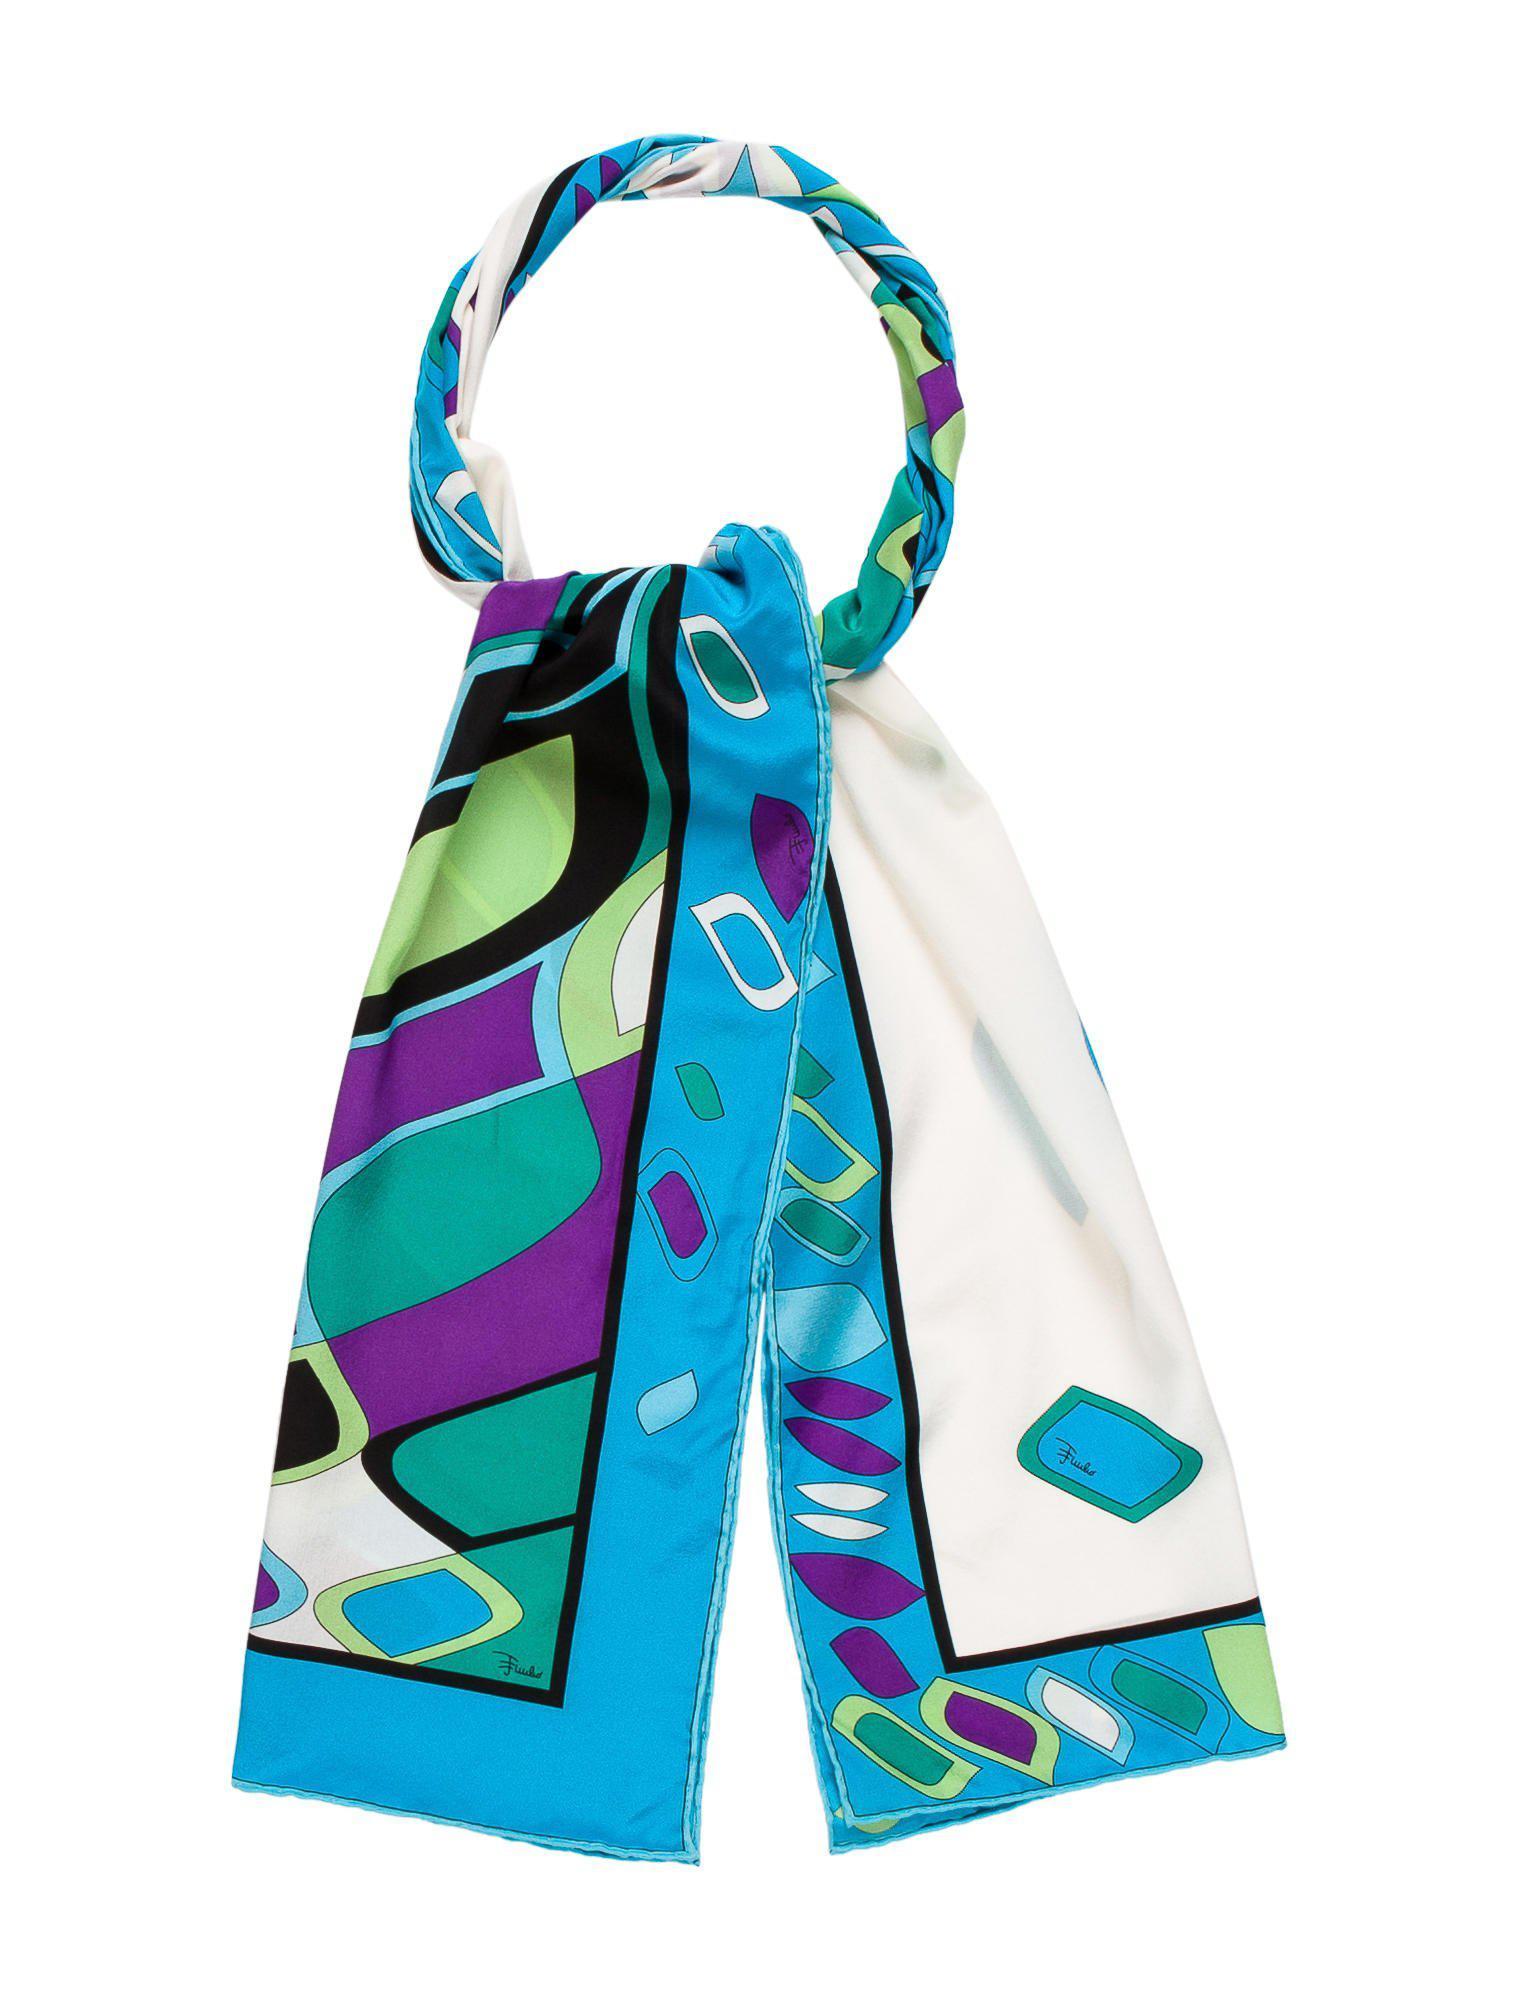 abstract floral print scarf - Multicolour Emilio Pucci Pdj7g